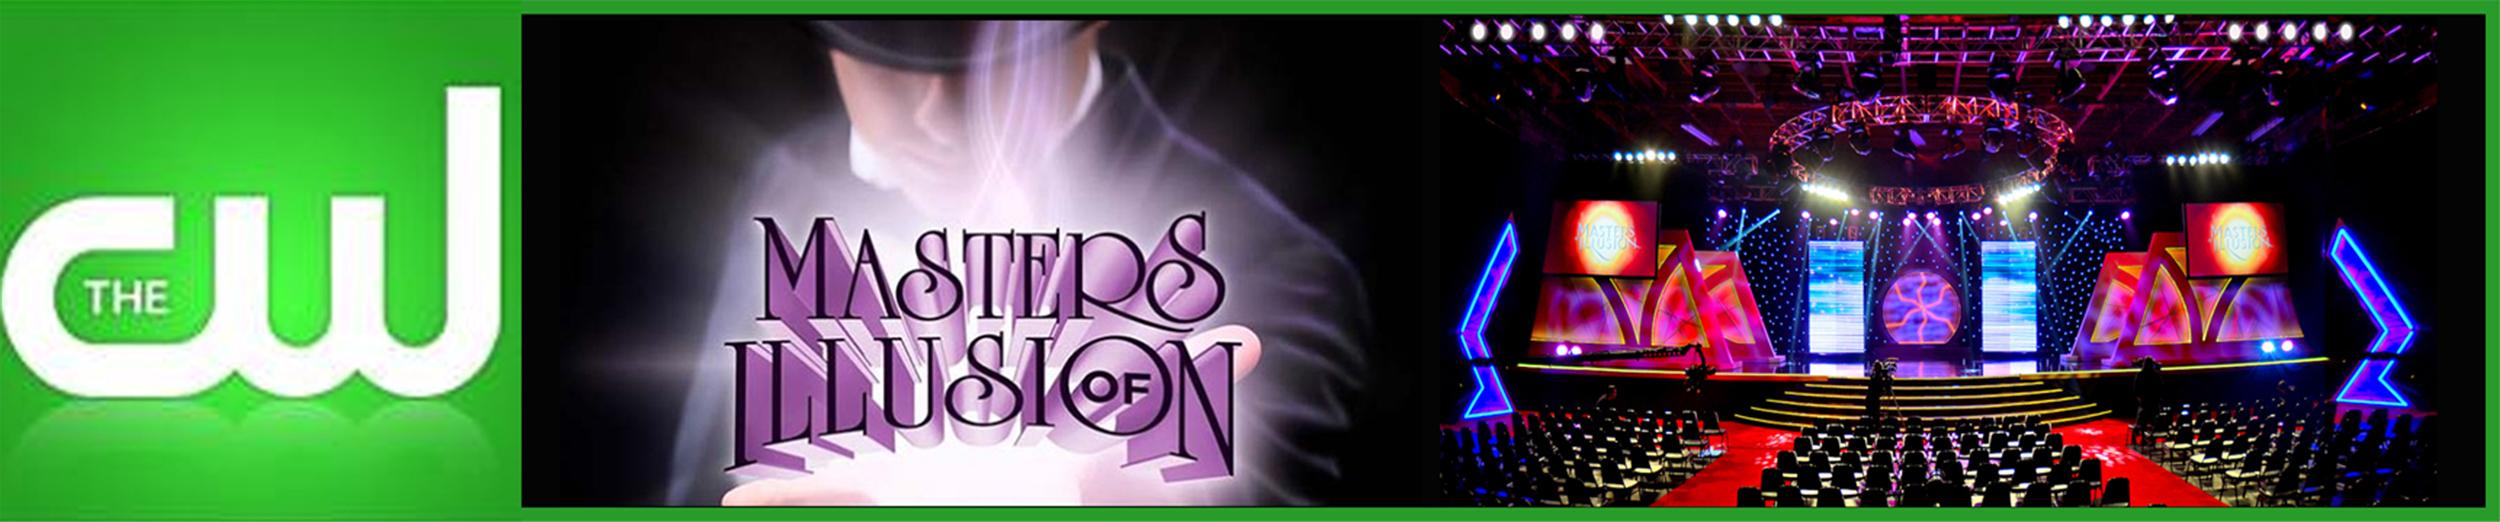 tl-masters-of-illusion